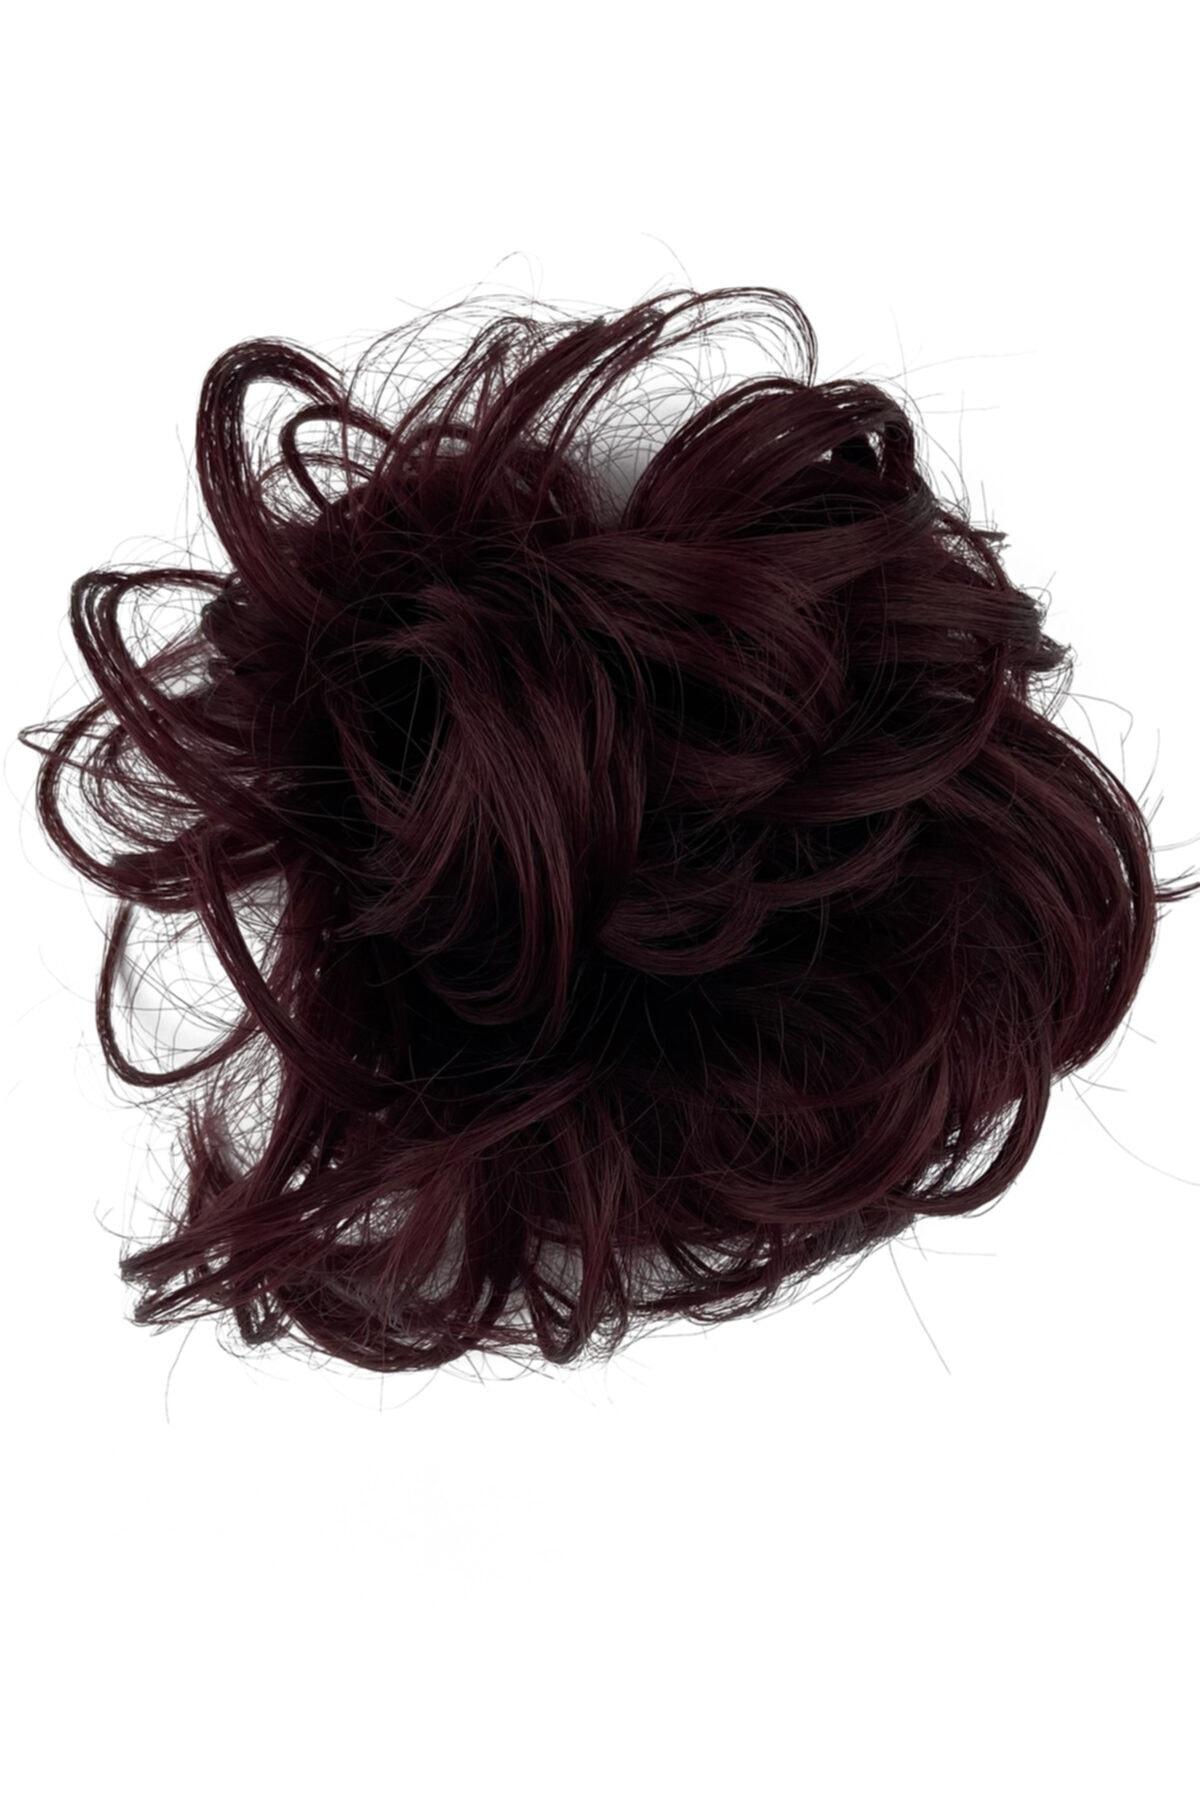 Eva Peruk Koyu Kızıl Saç Lastikli Topuz Toka 1